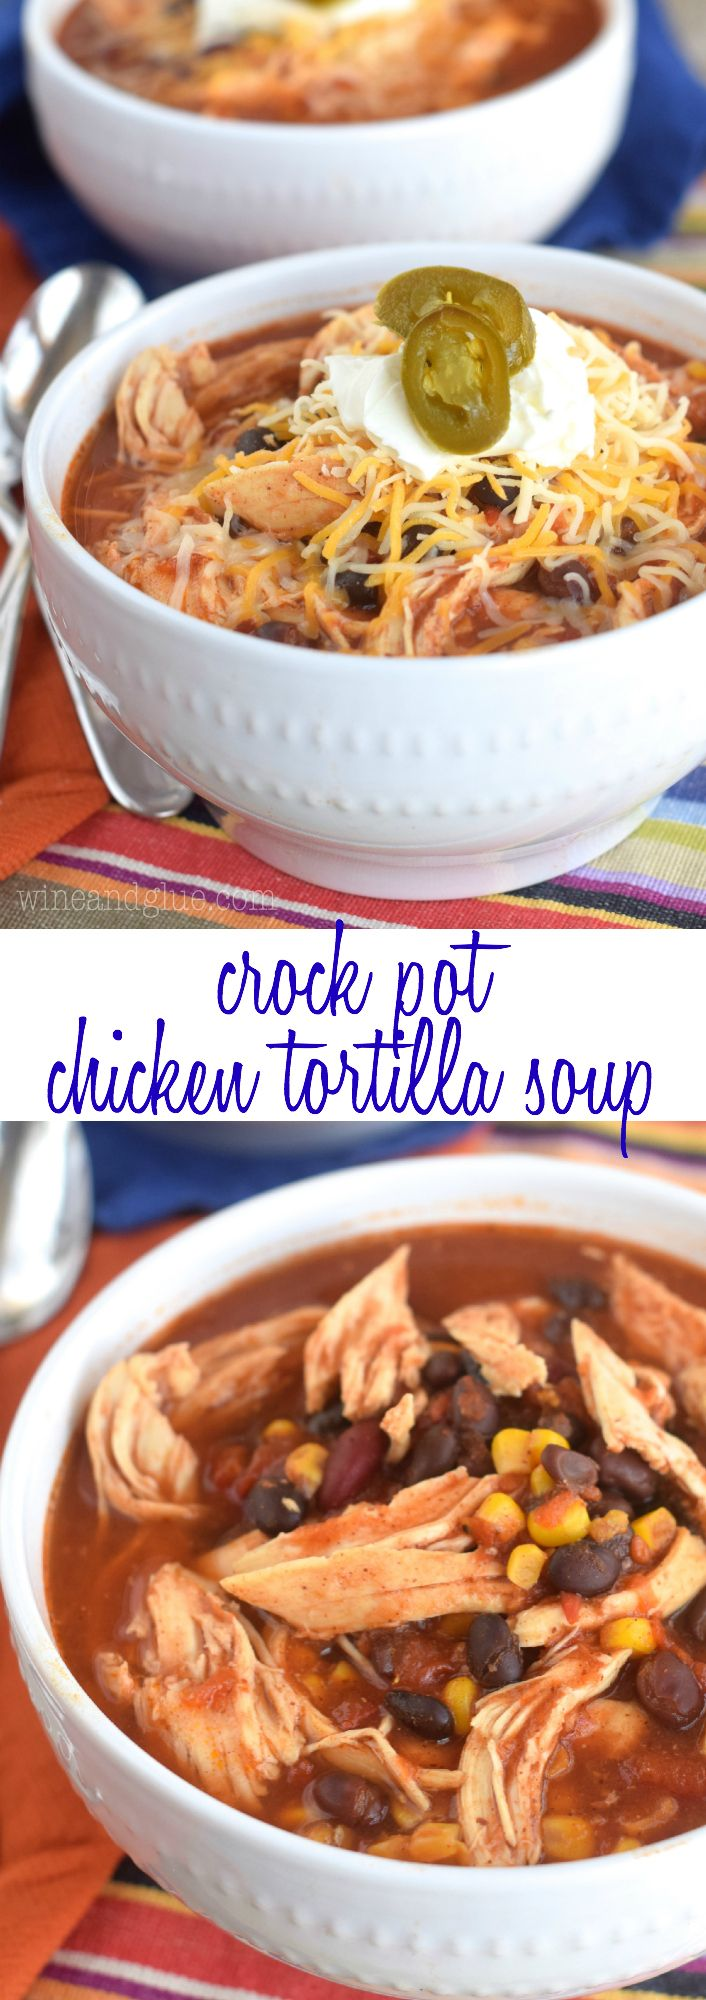 This Crock Pot Chicken Tortilla Soup | Five minutes prep and less than 300 calories a bowl!